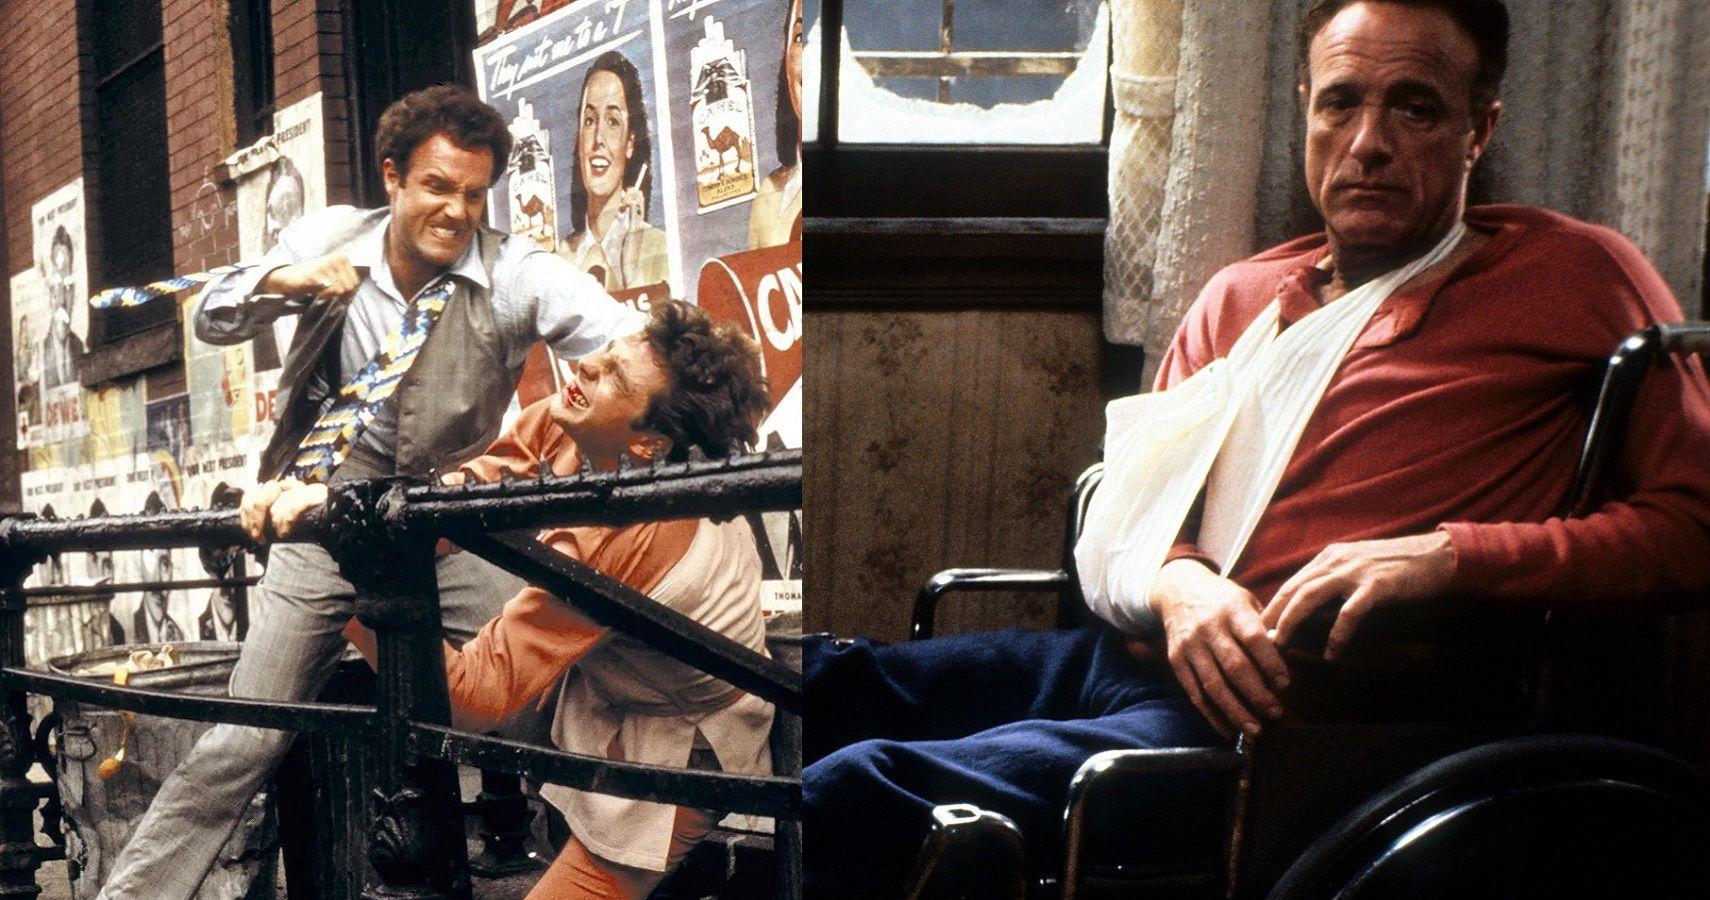 James Caan's 10 Best Movies, Ranked (According To IMDB)